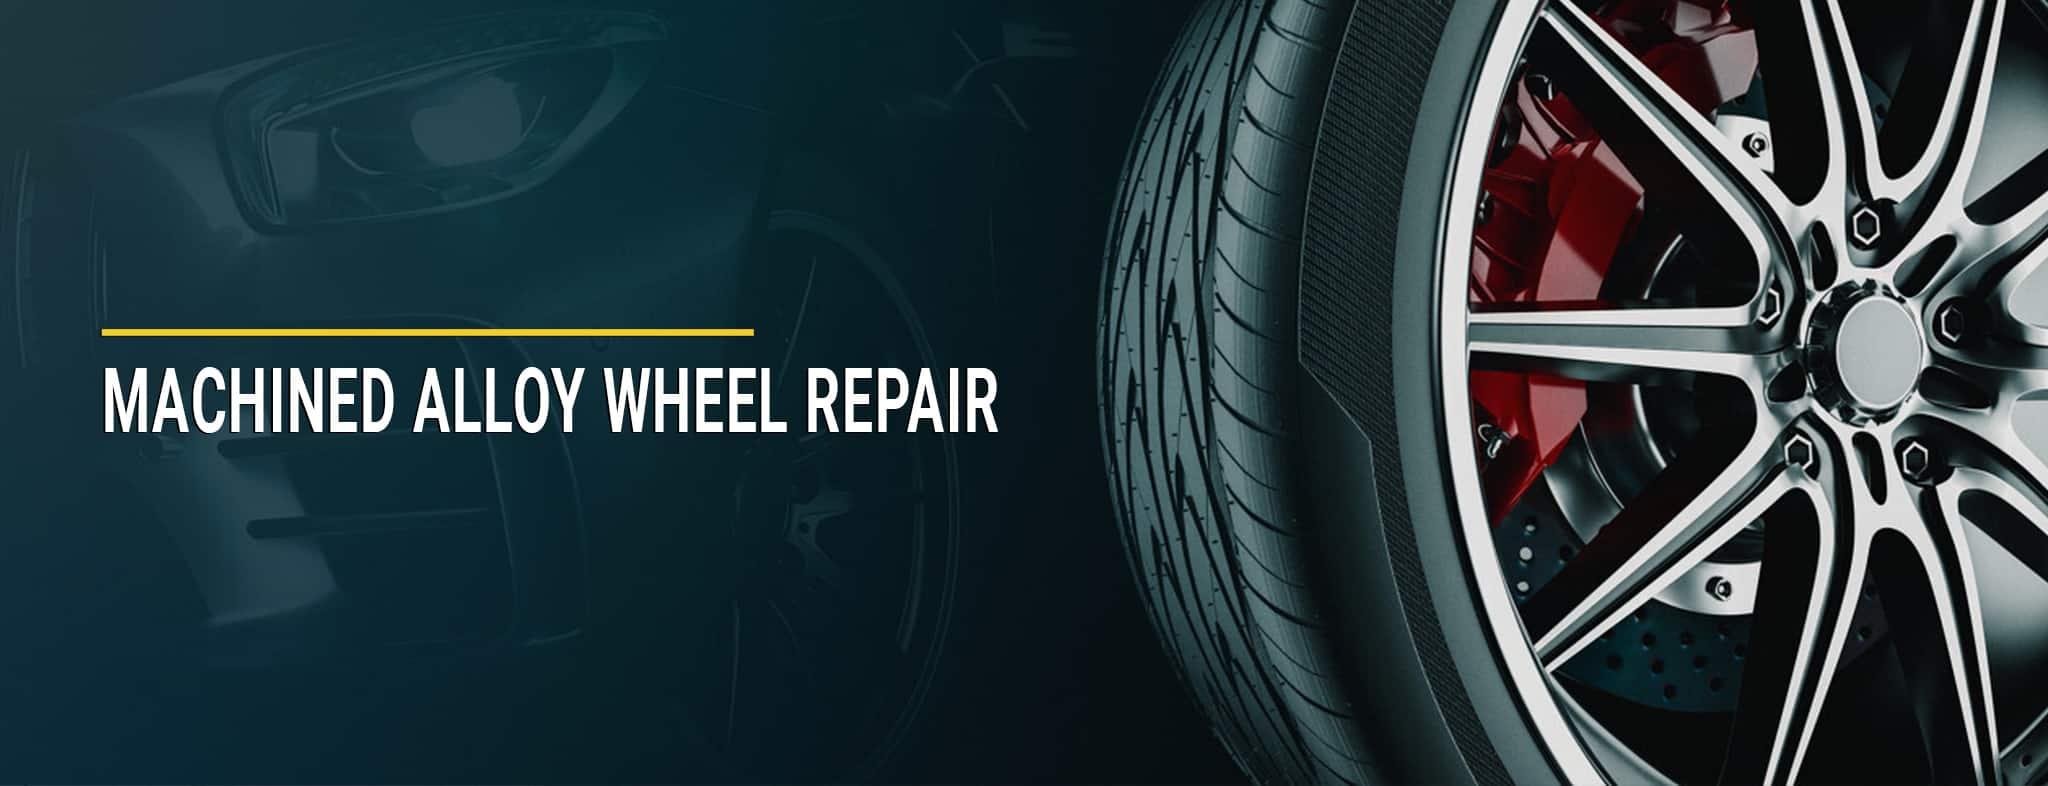 machined alloy wheel repair service